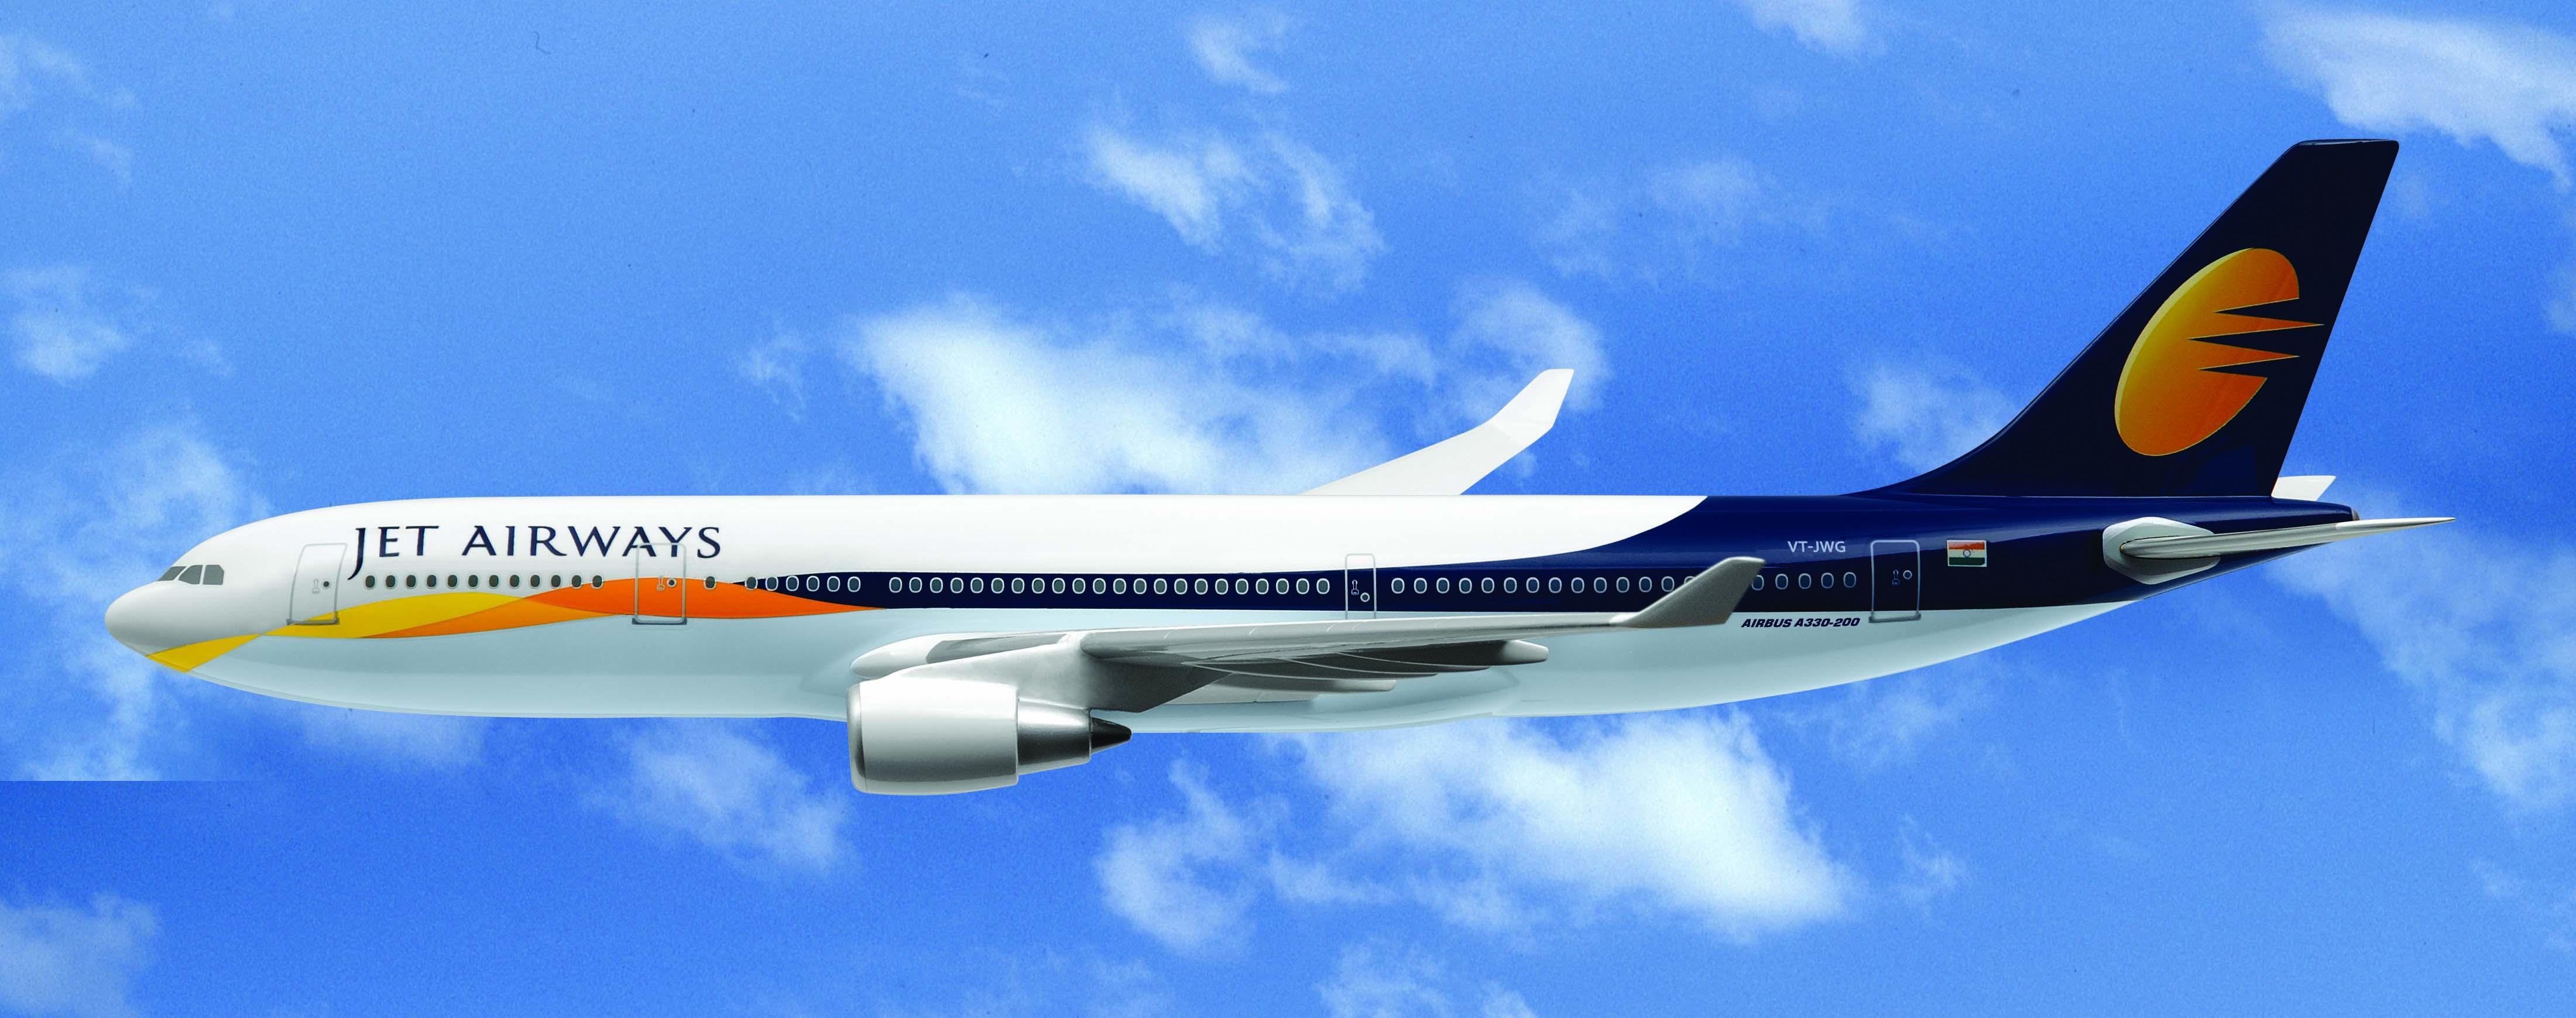 India Air Travel Growth